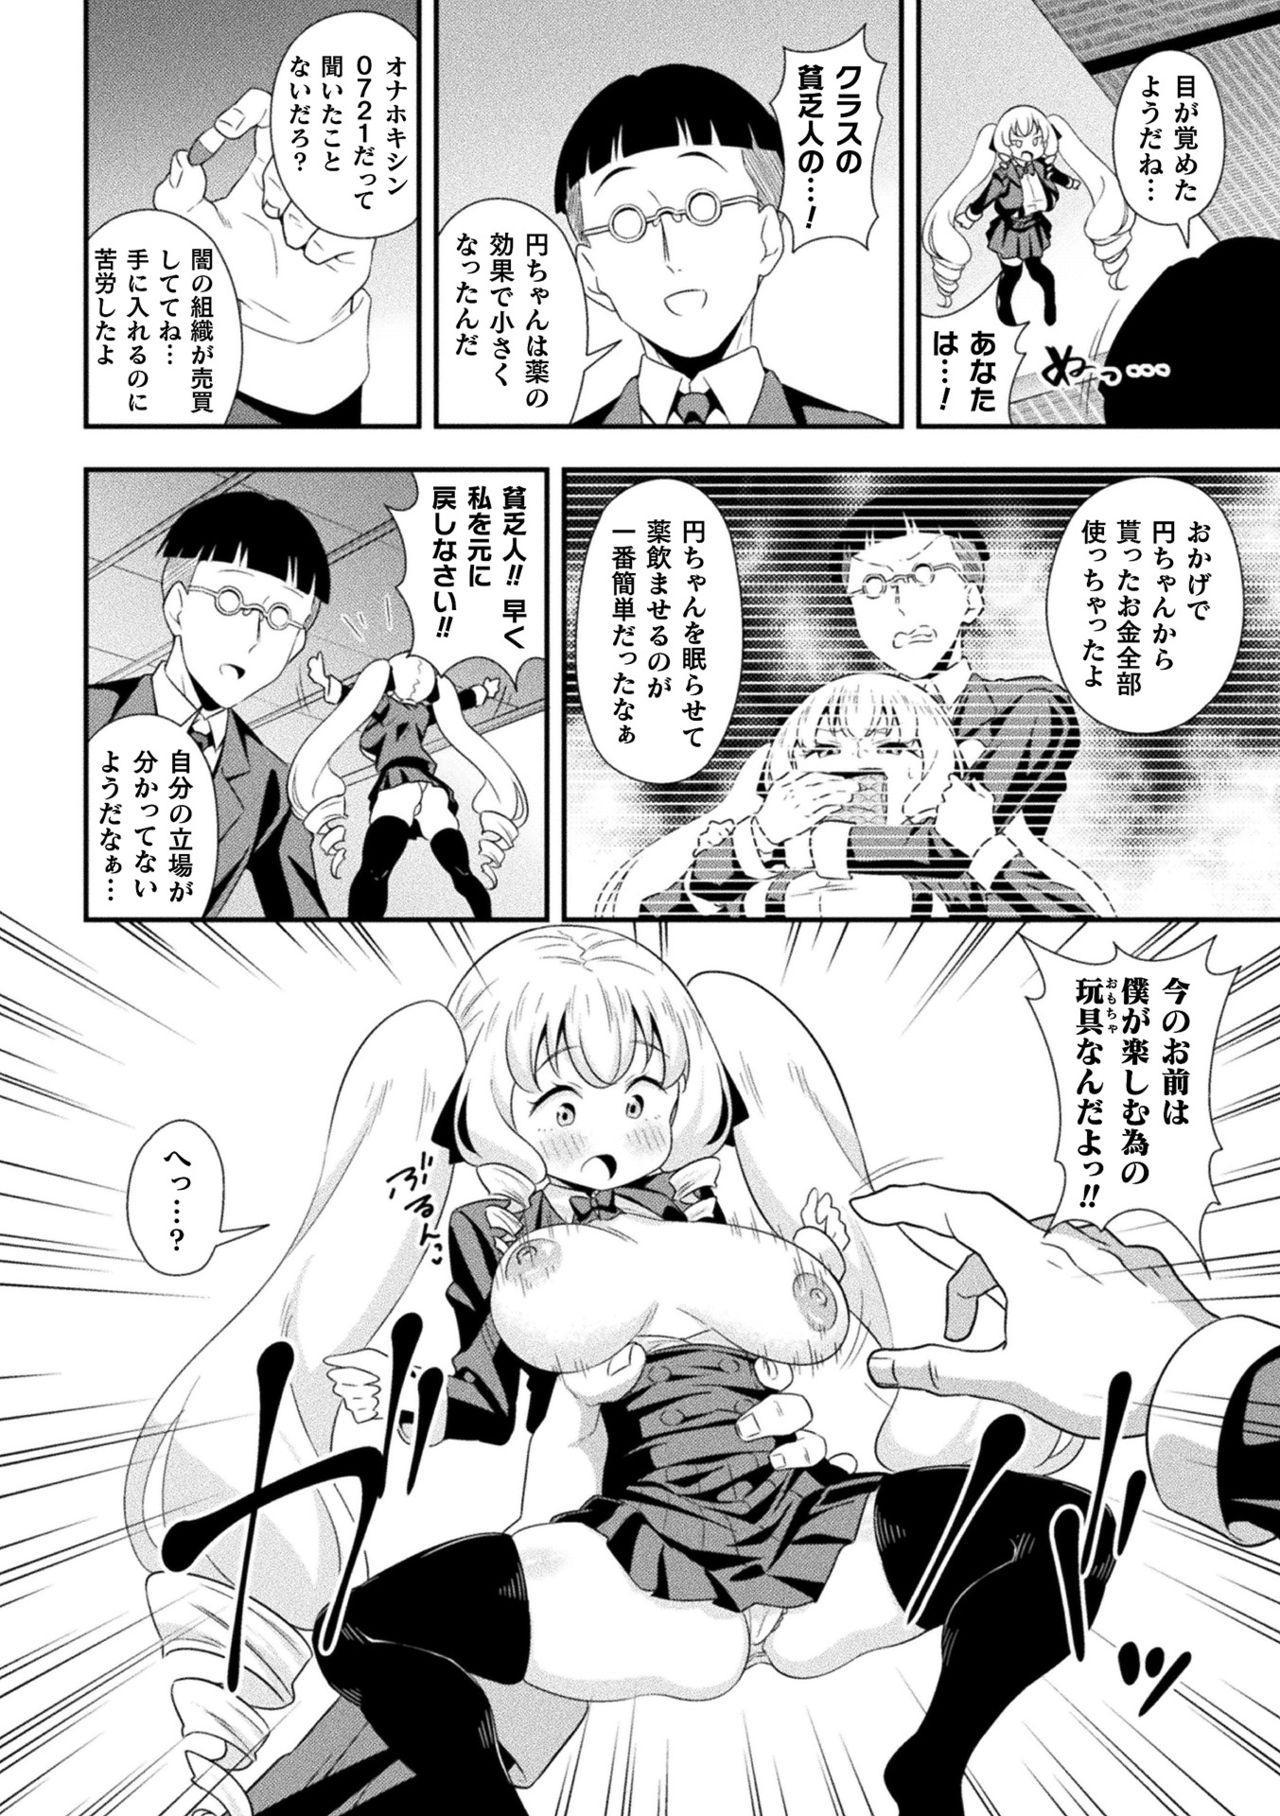 2D Comic Magazine - Syukusyouka Hiroin Kyousei Onahole Keikaku Vol. 2 5